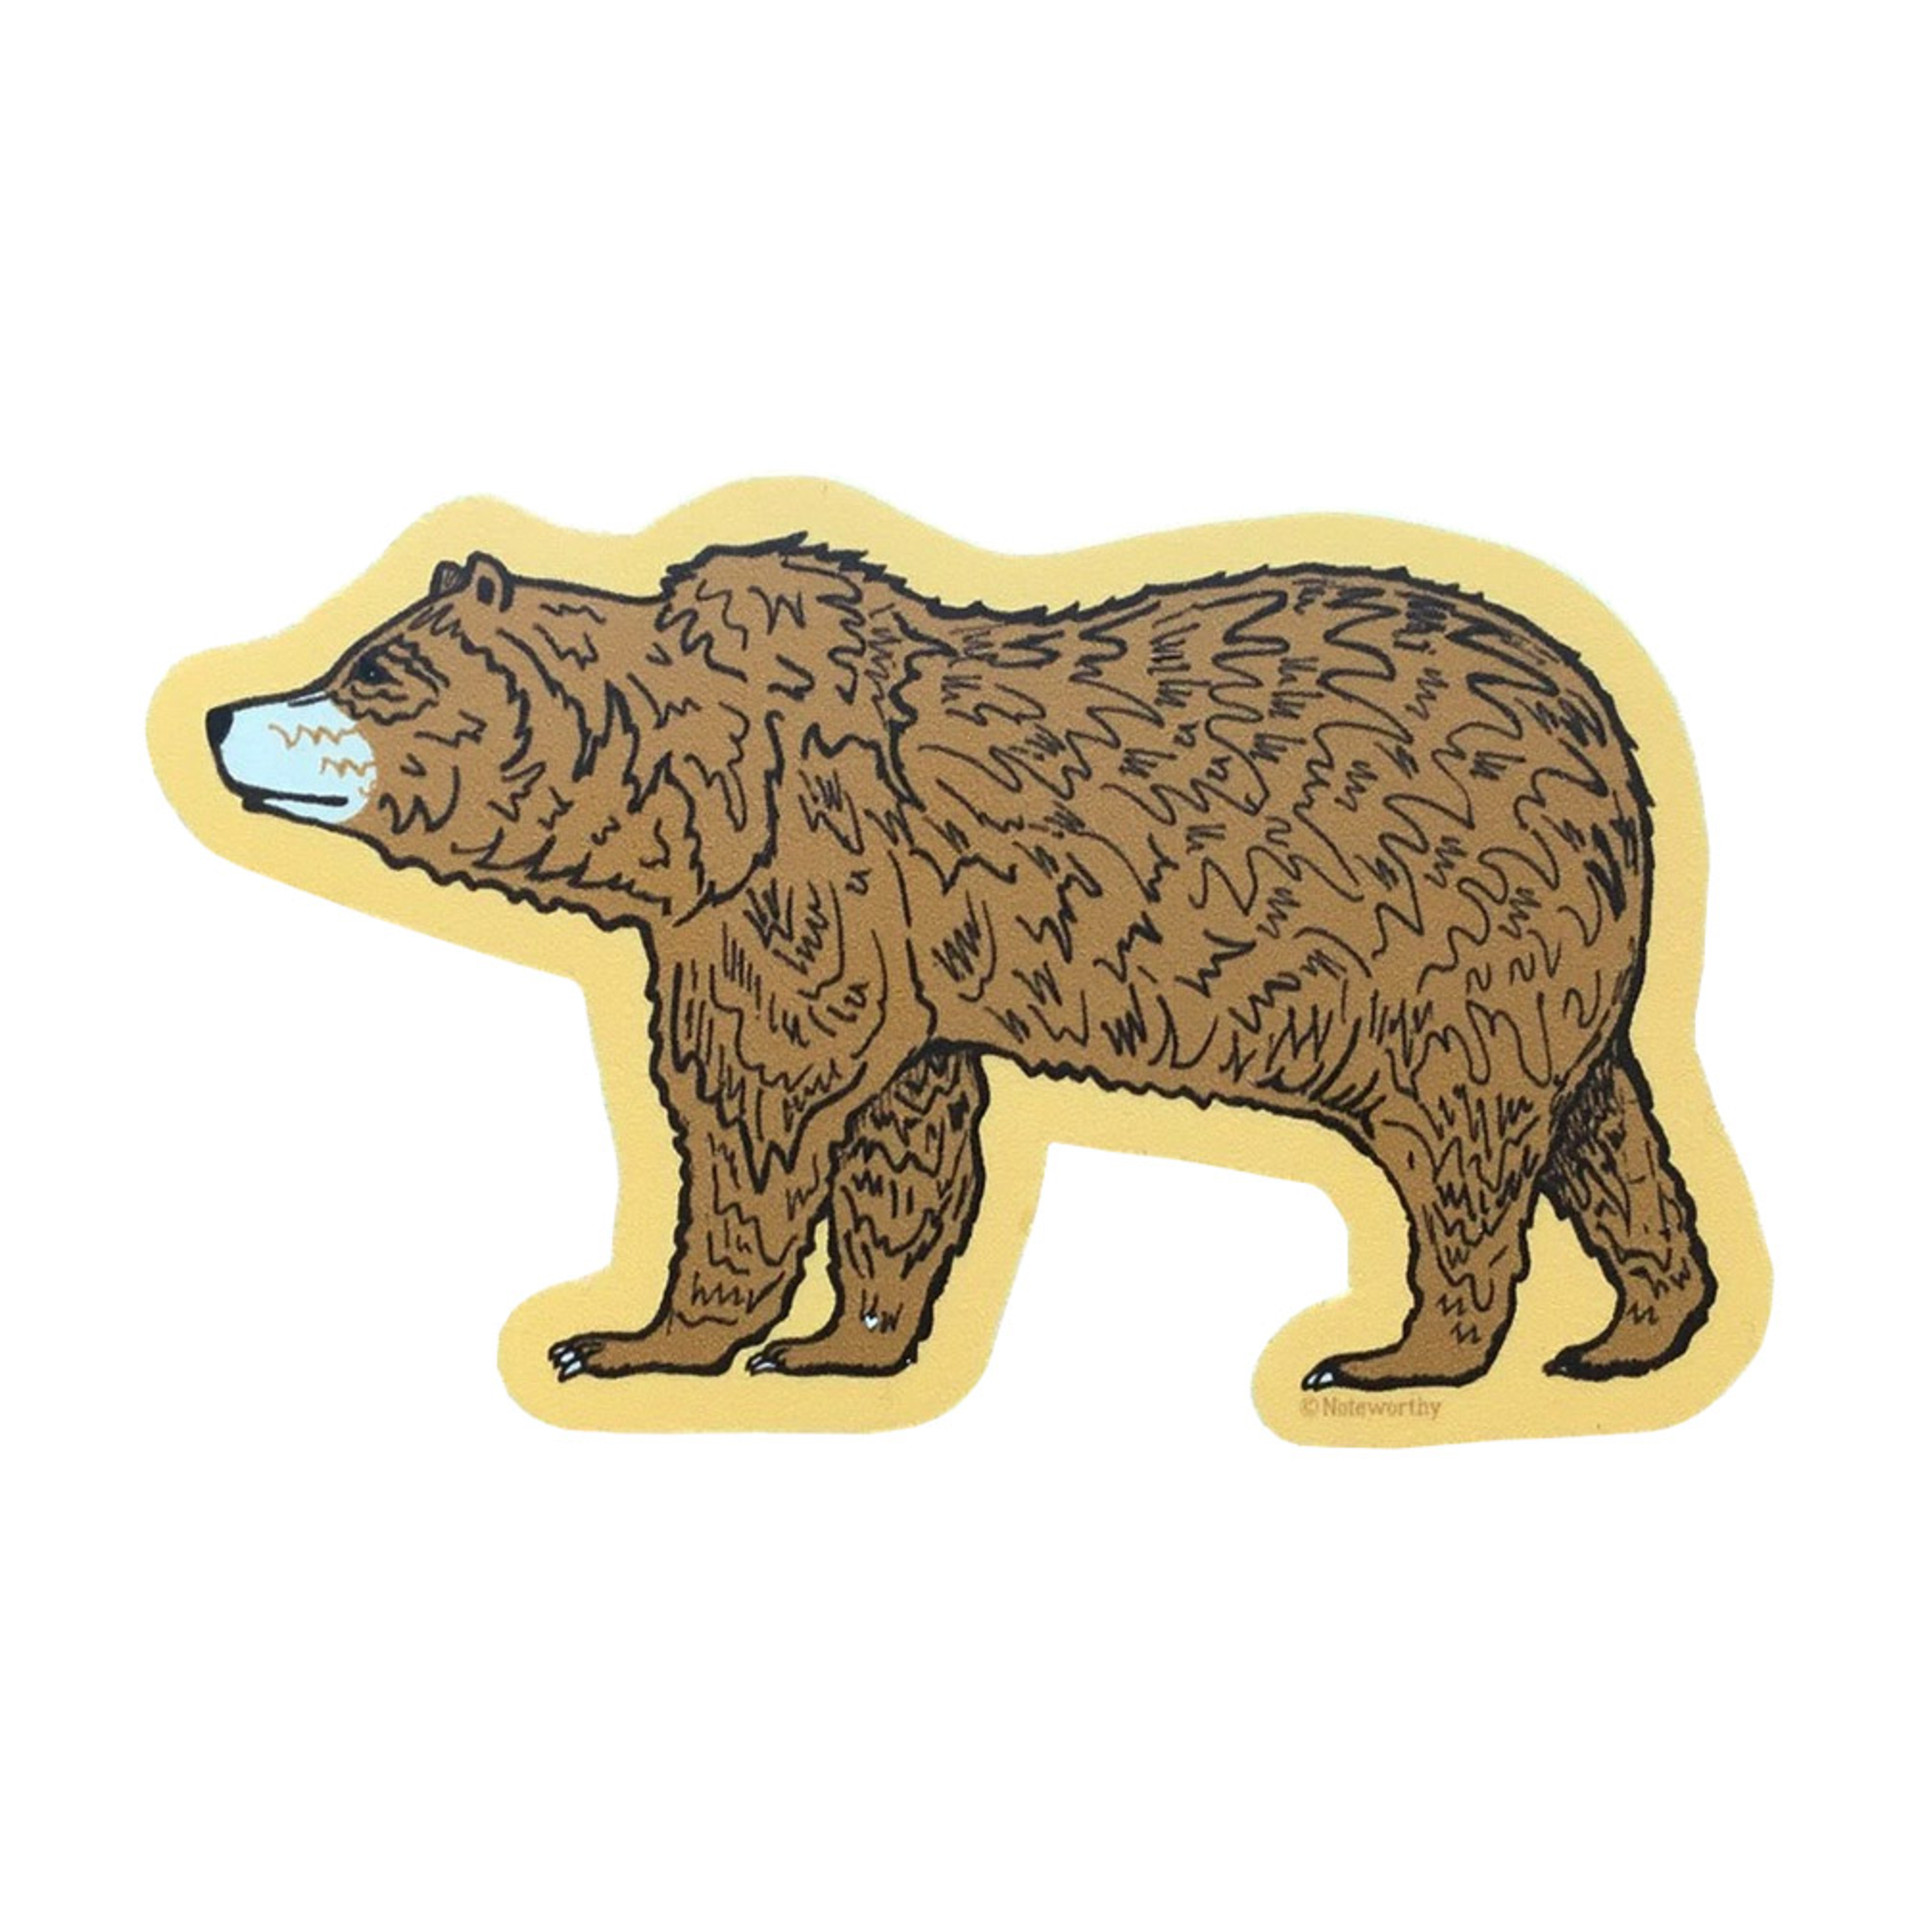 Noteworthy Grizzly Bear Sticker